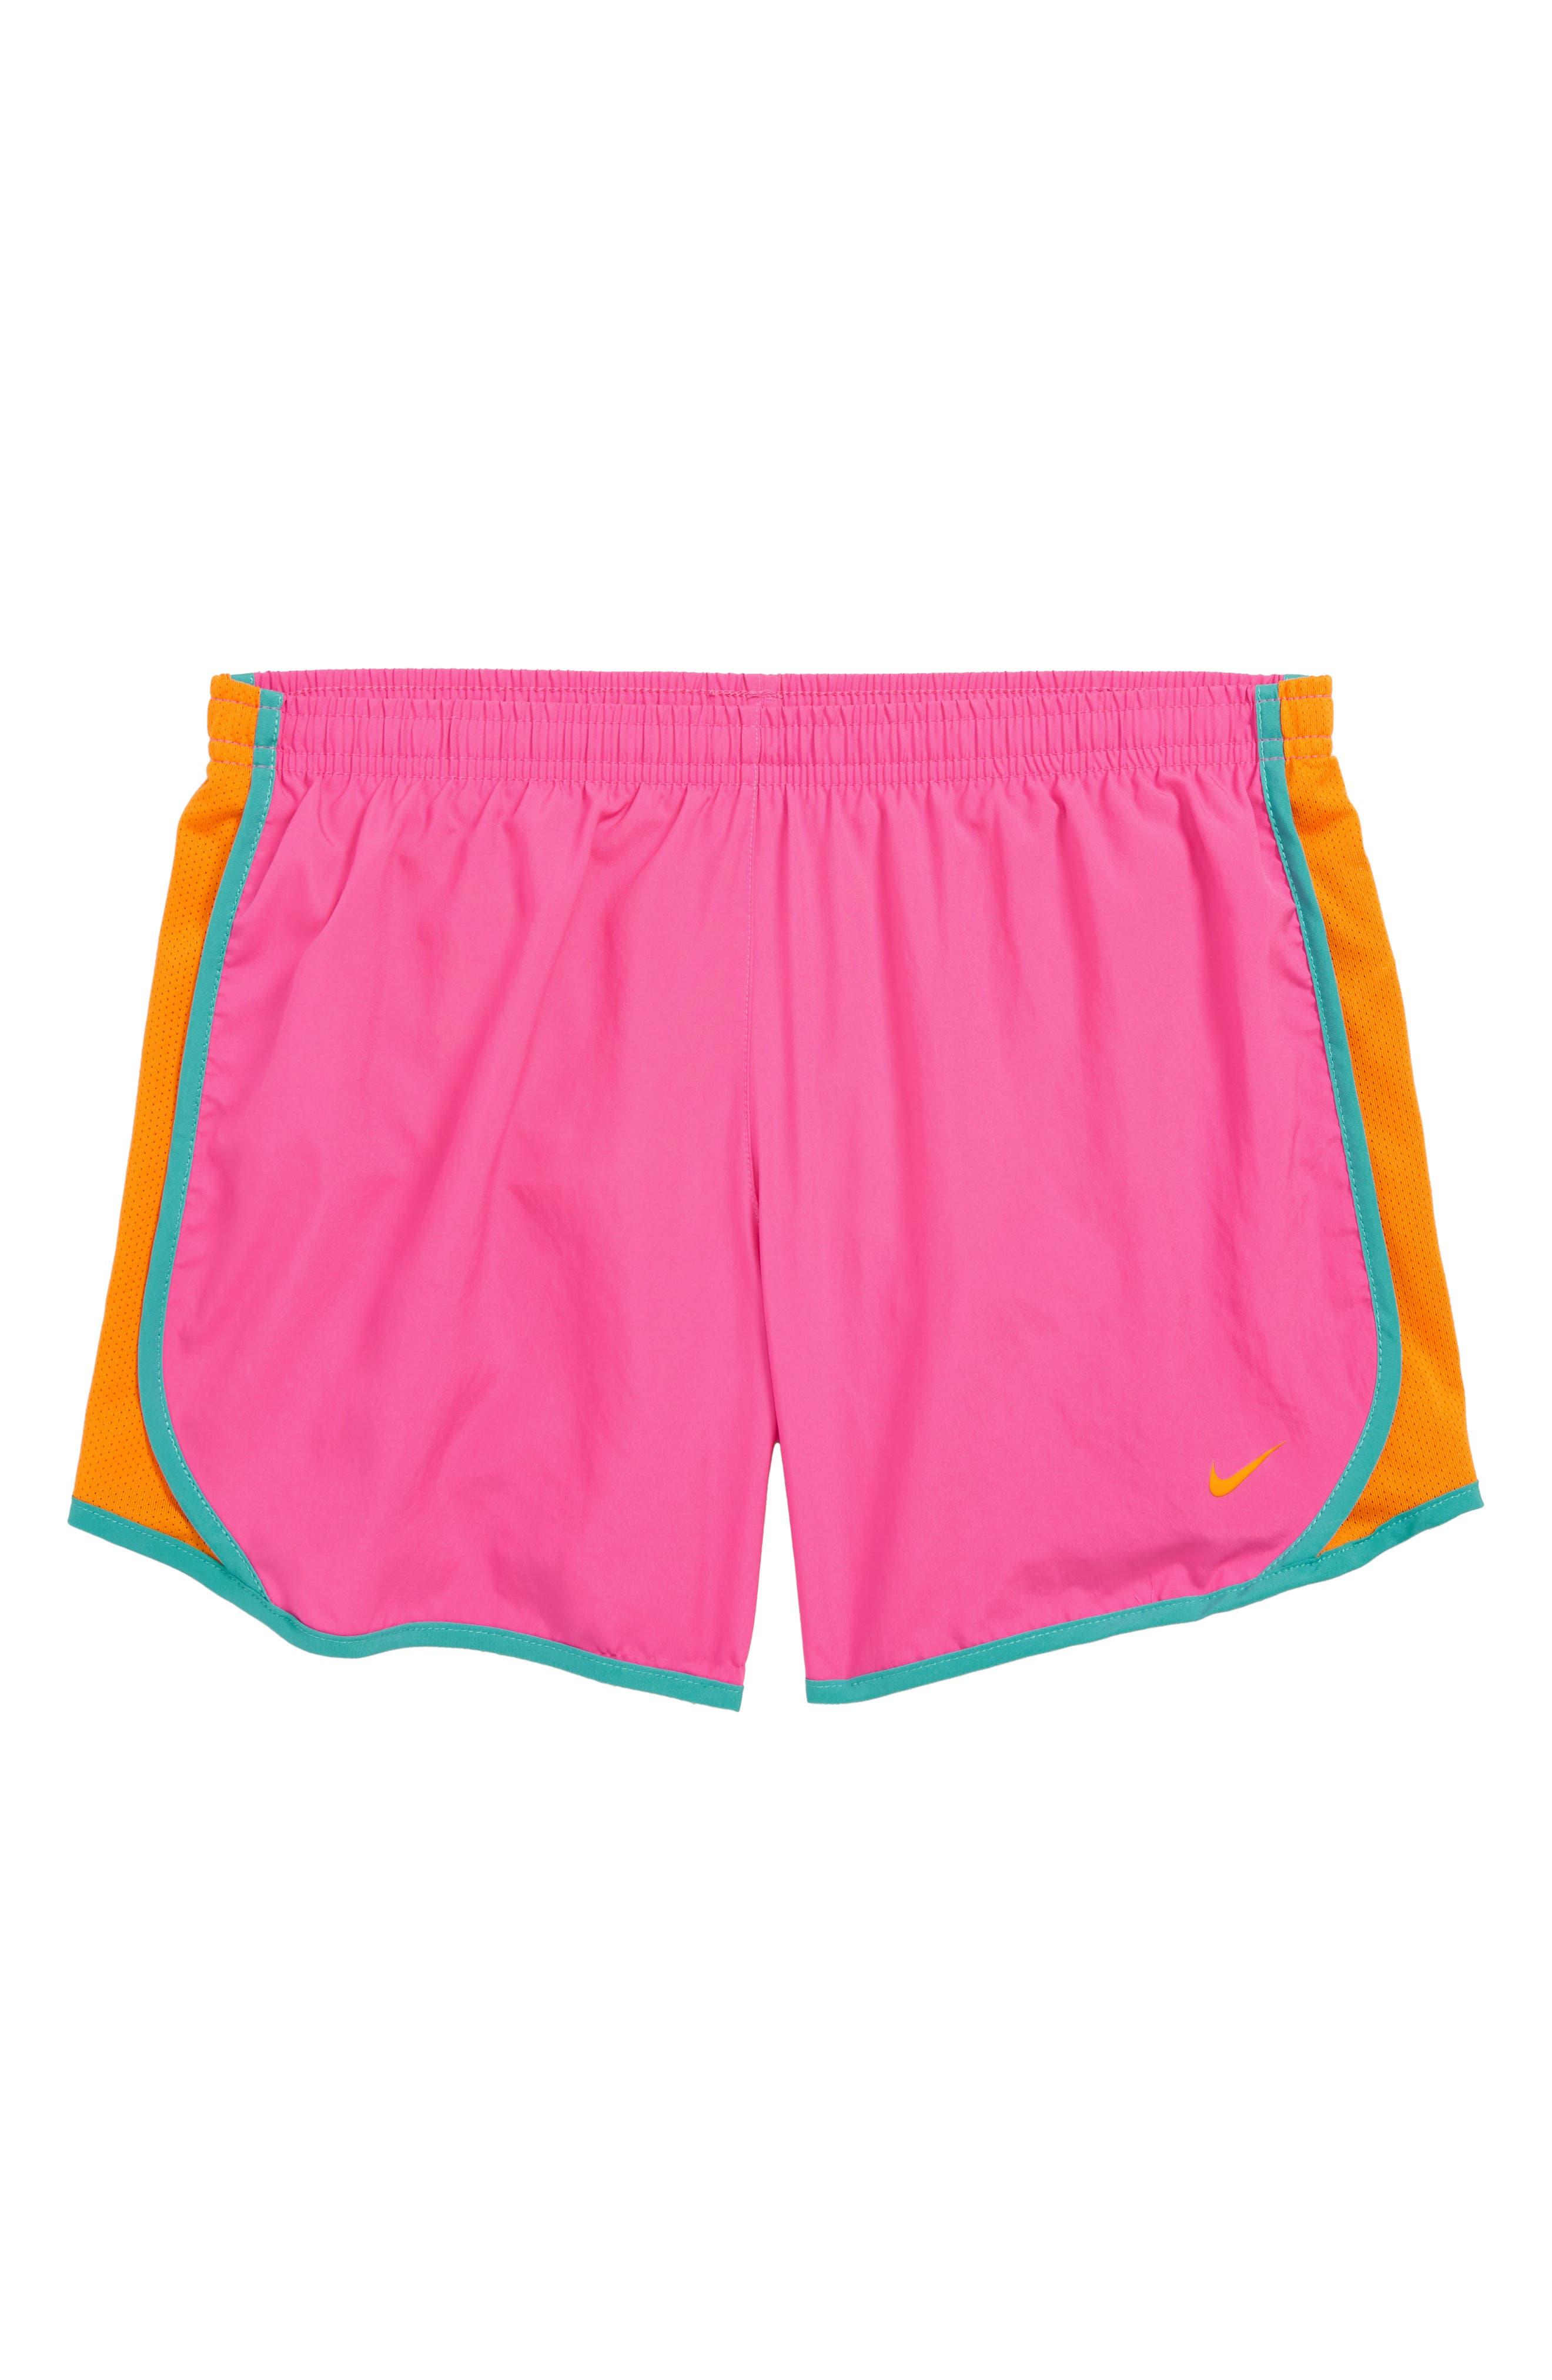 NIKE, Dry Tempo Running Shorts, Main thumbnail 1, color, LASER FUCHSIA/ ORANGE PEEL